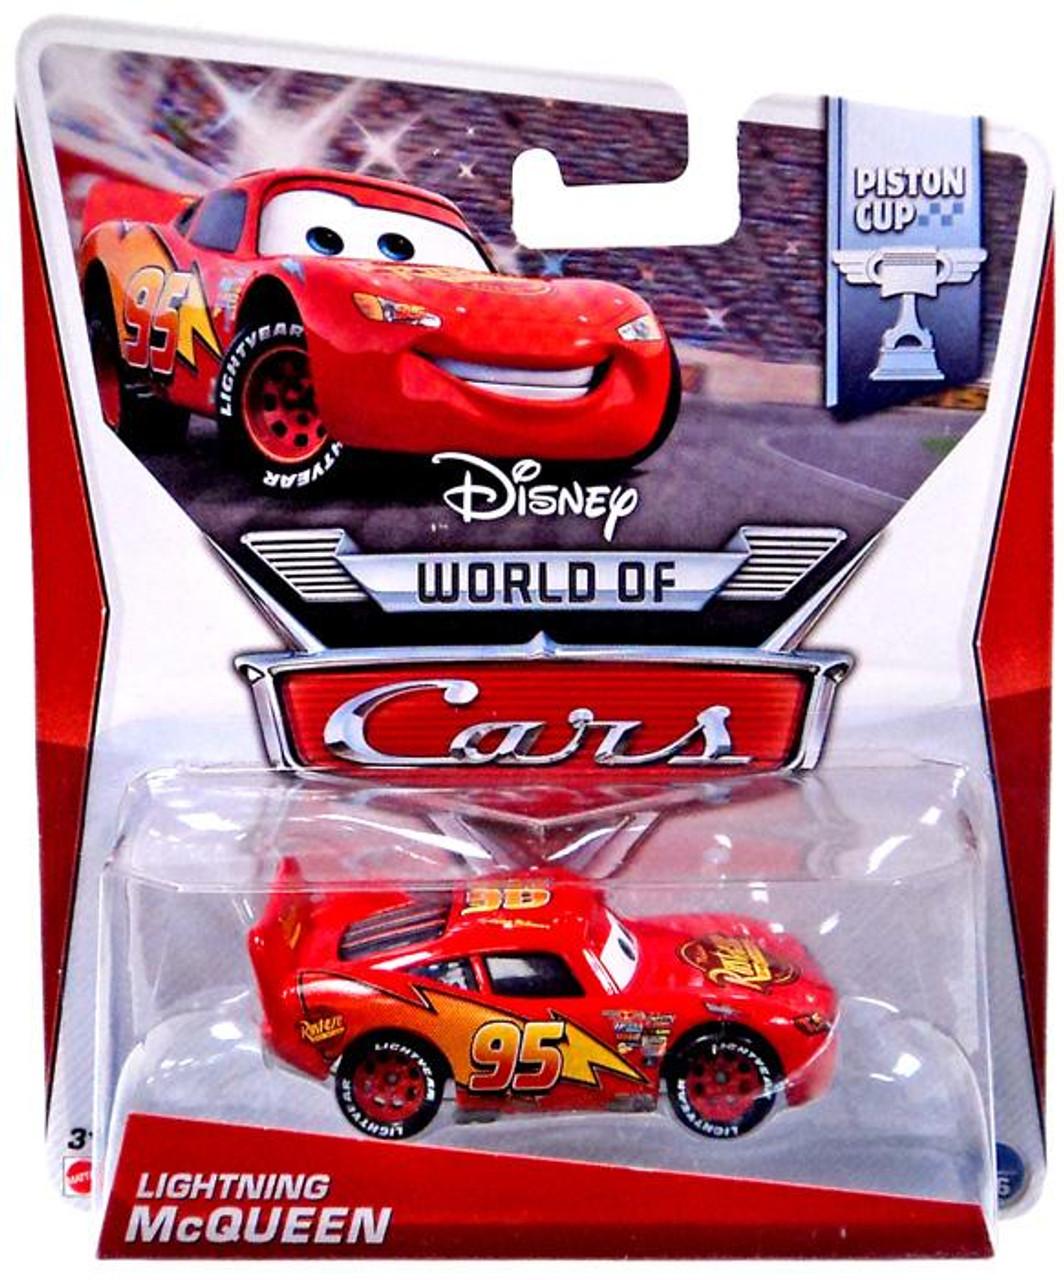 Disney Cars The World of Cars Lightning McQueen Diecast Car #1